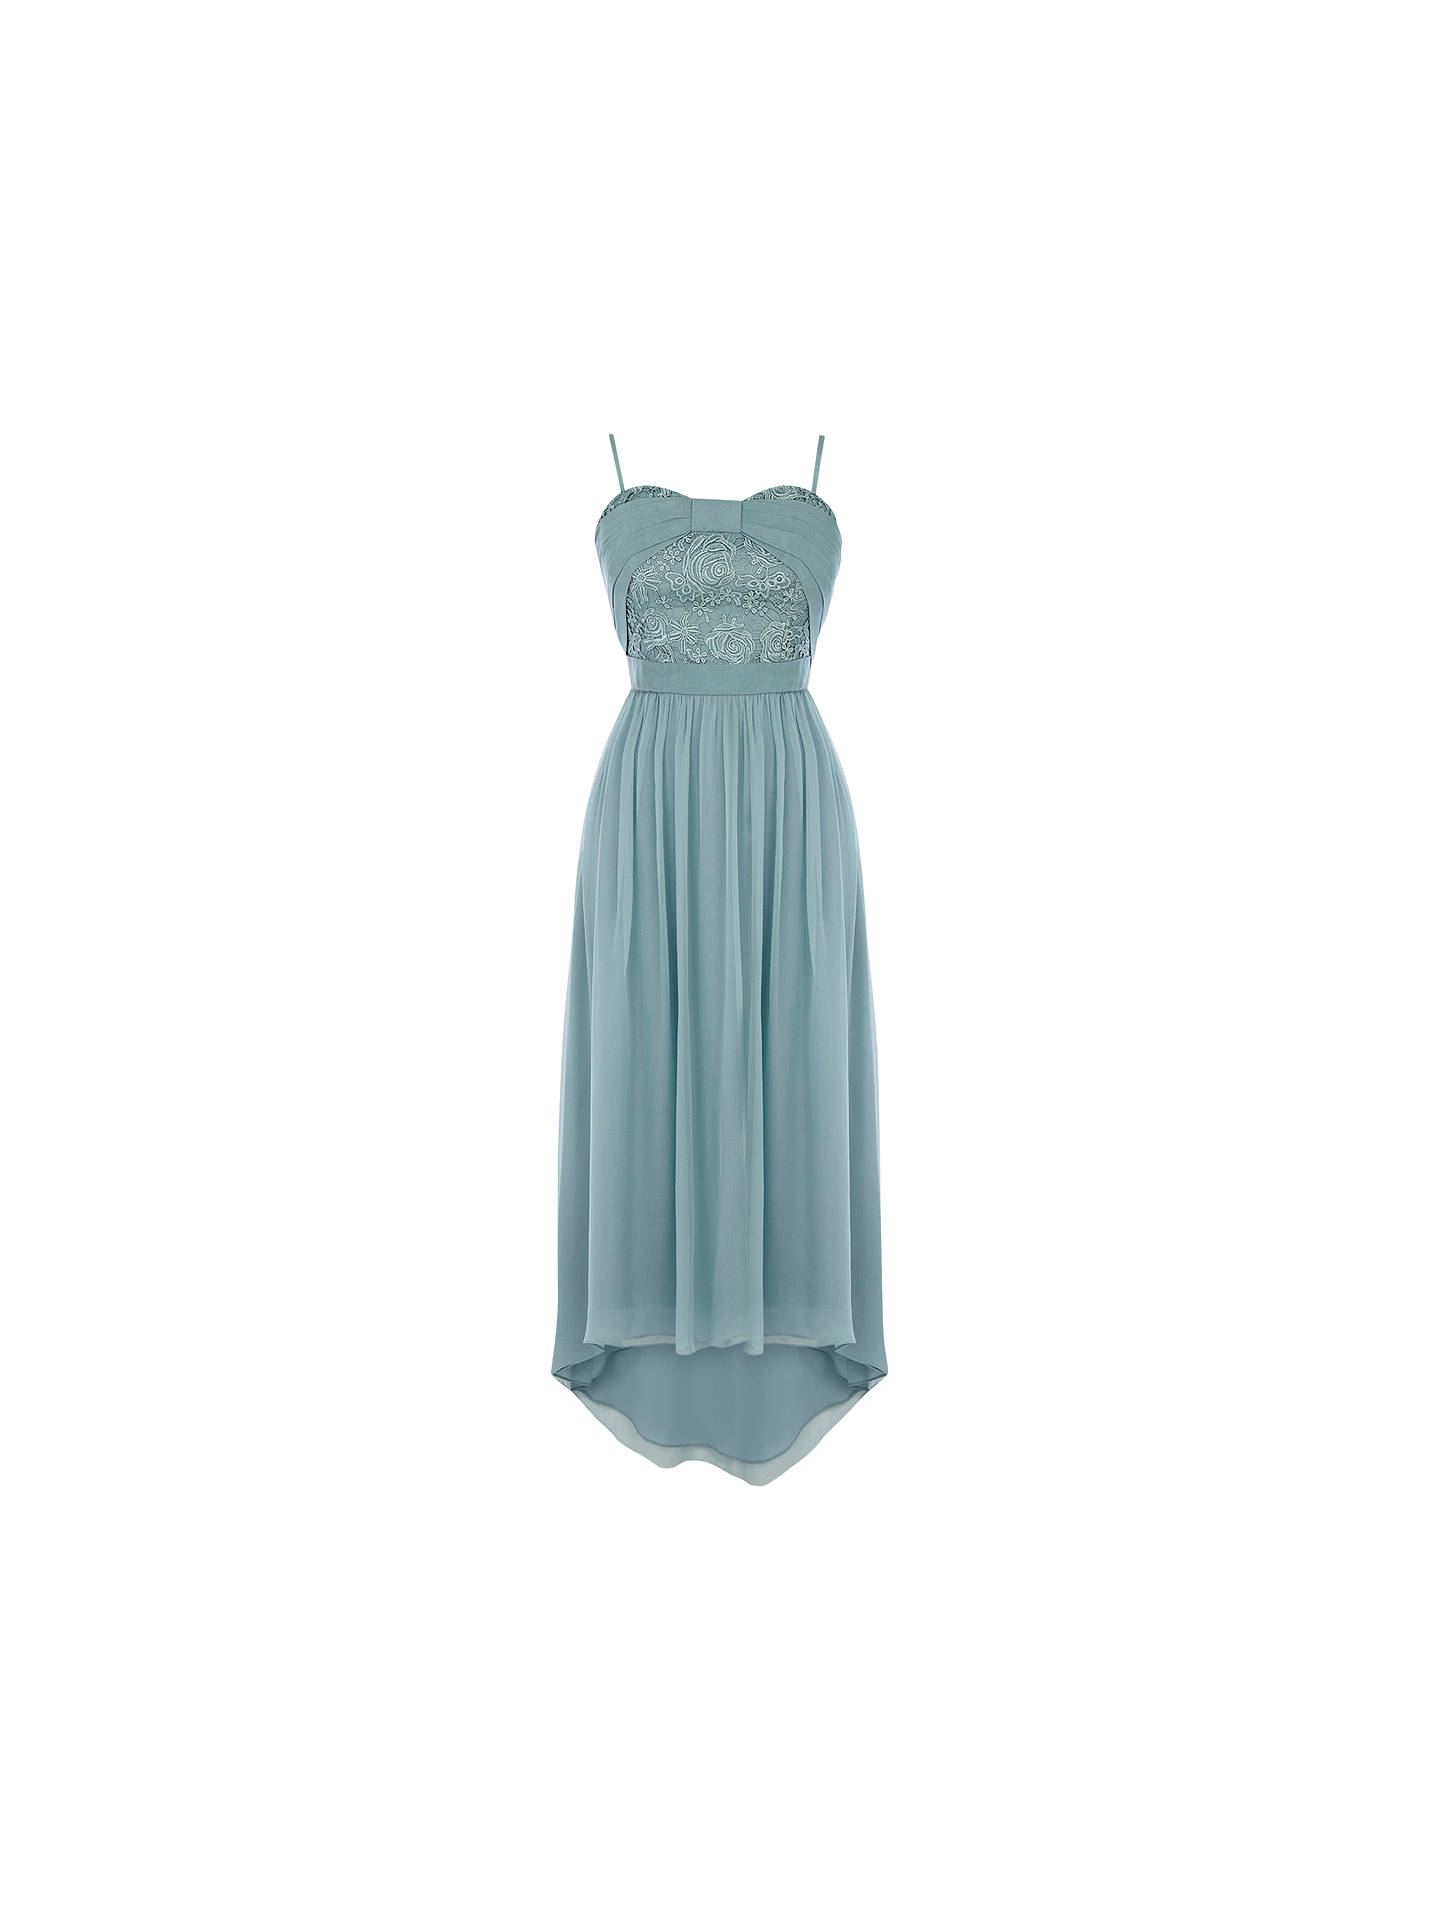 834ef704a38 Buy Coast Theodora Maxi Dress